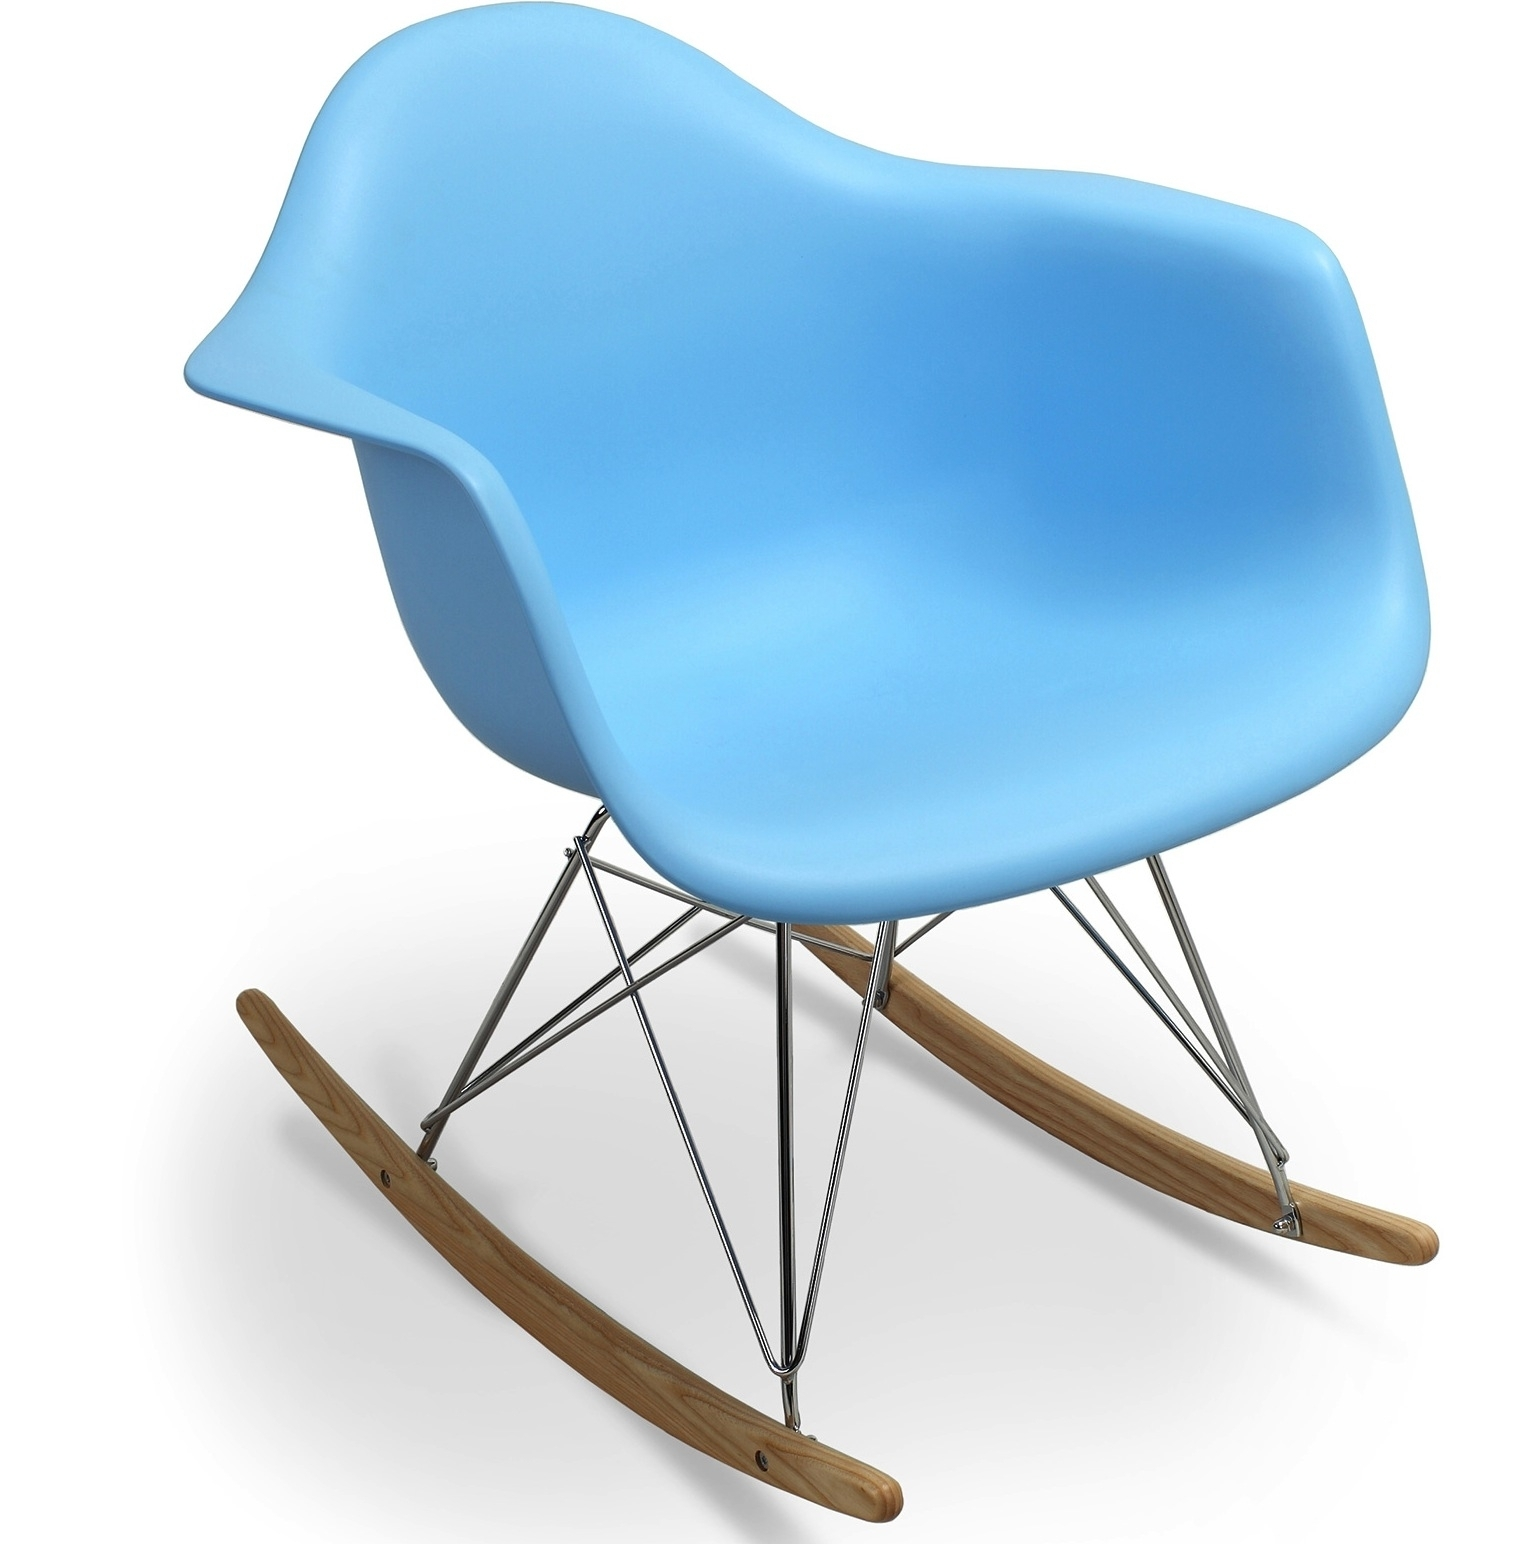 Fauteuil bascule bleu mat inspir e charles eames for Achat fauteuil charles eames